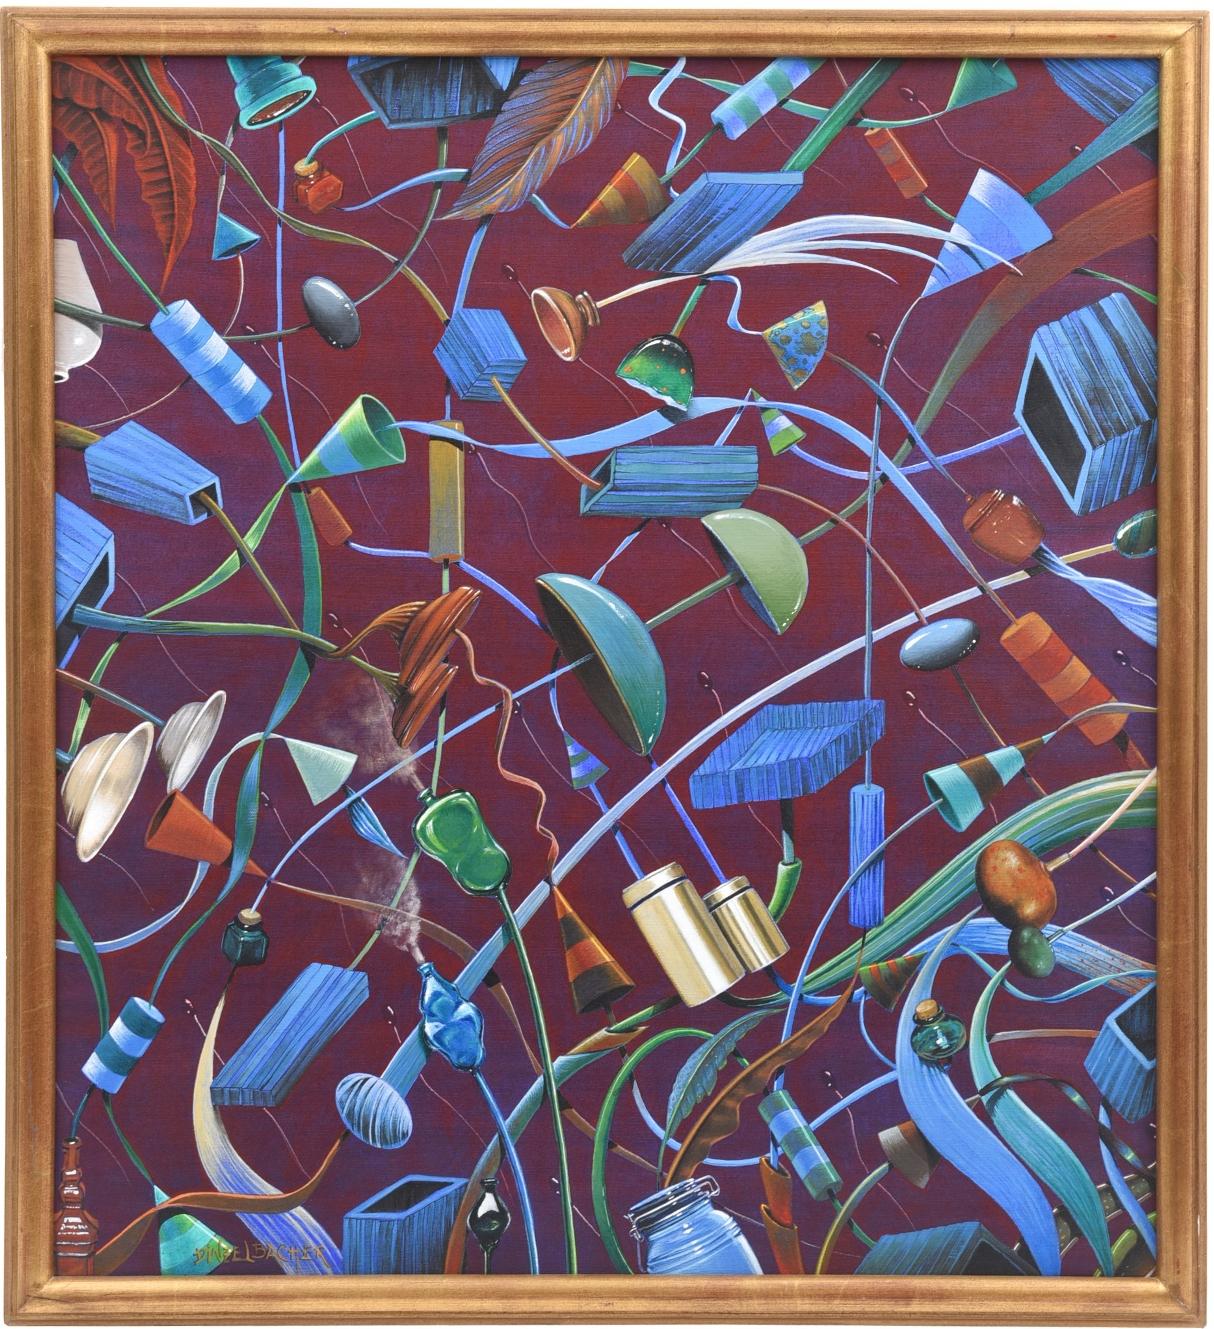 Magic Surrealist Painting By Claudio Dinzelbacher Modernism